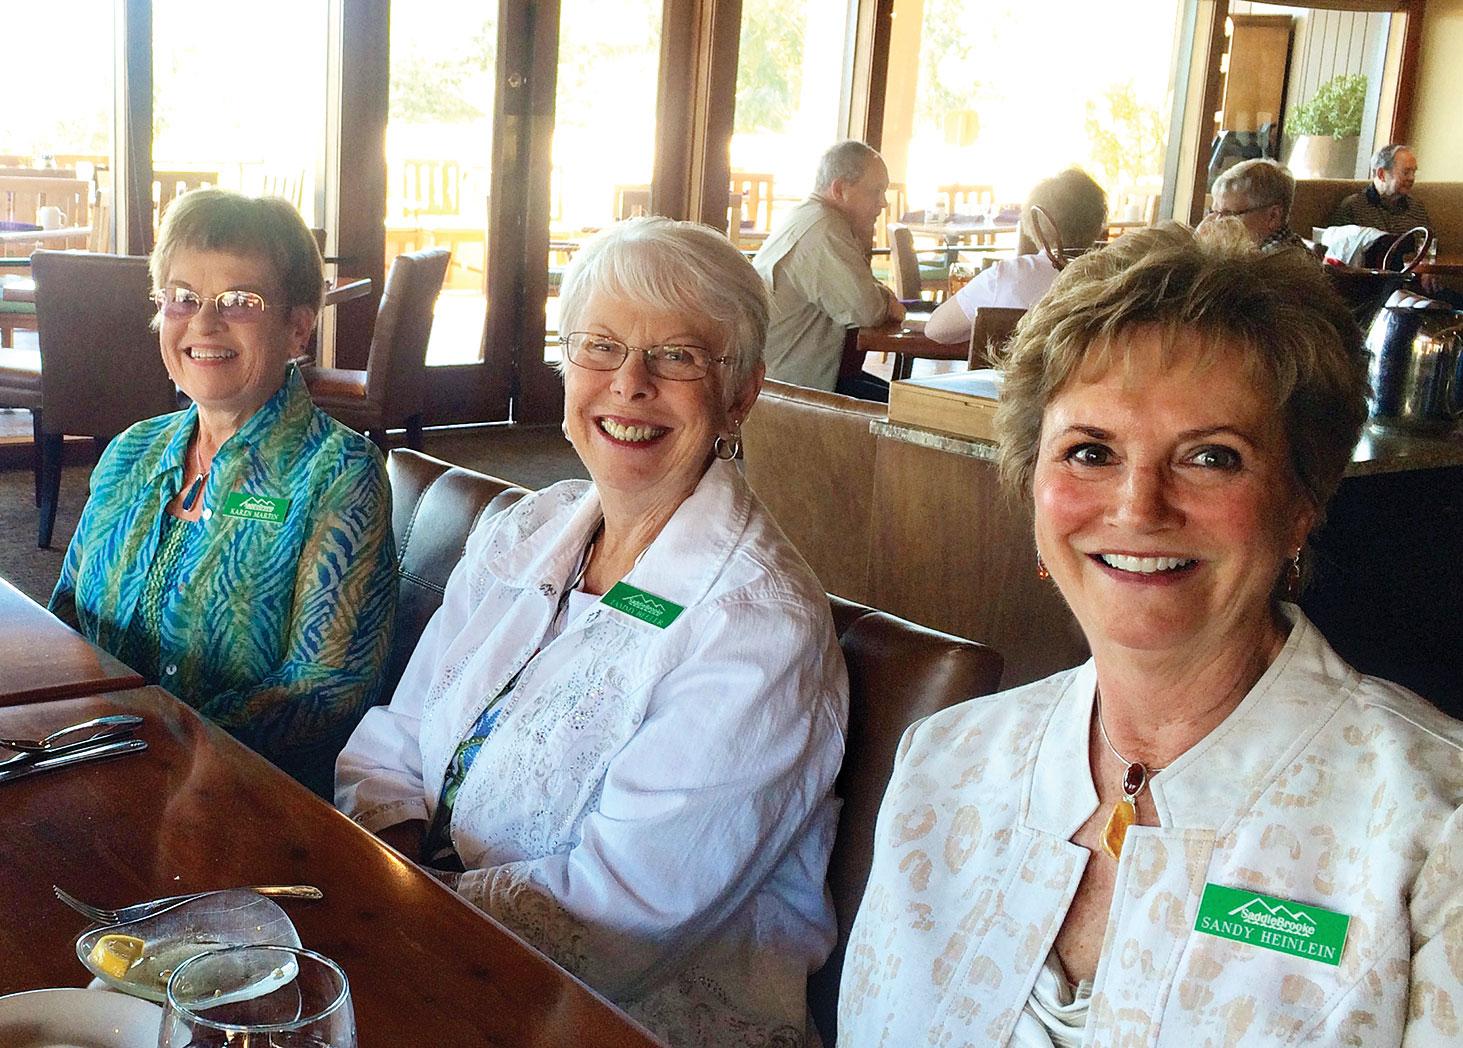 Left to right: Karen Martin, Tammy Beeler and Sandy Heinlein